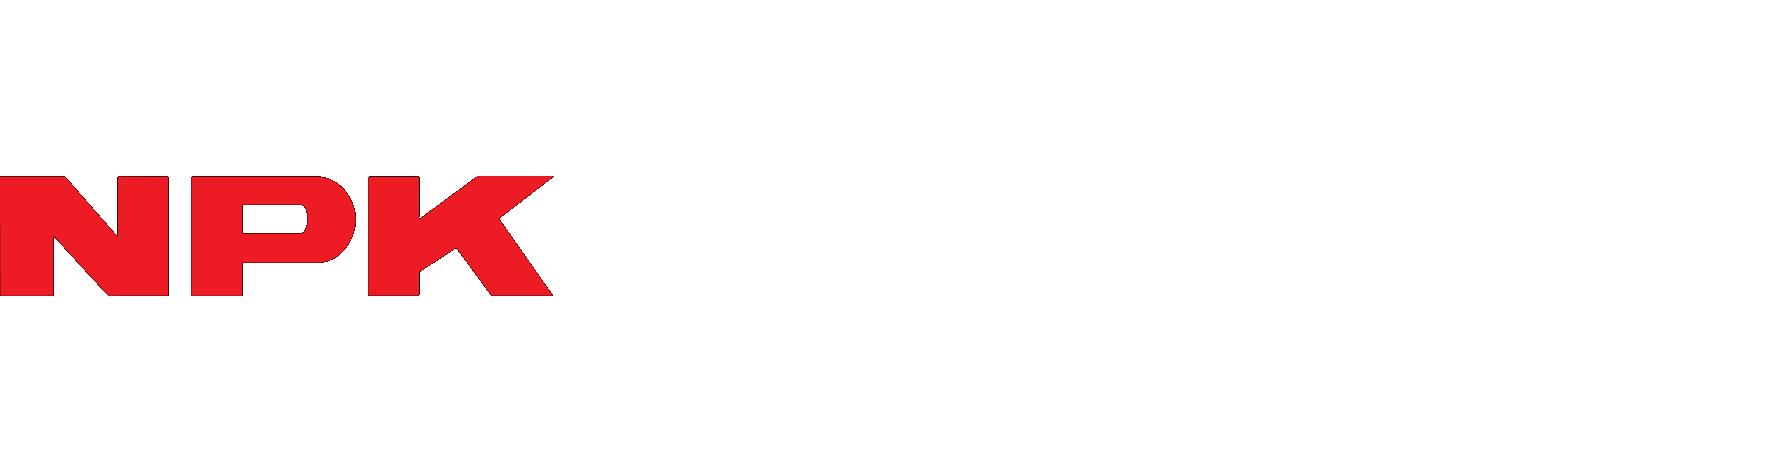 npk_logo